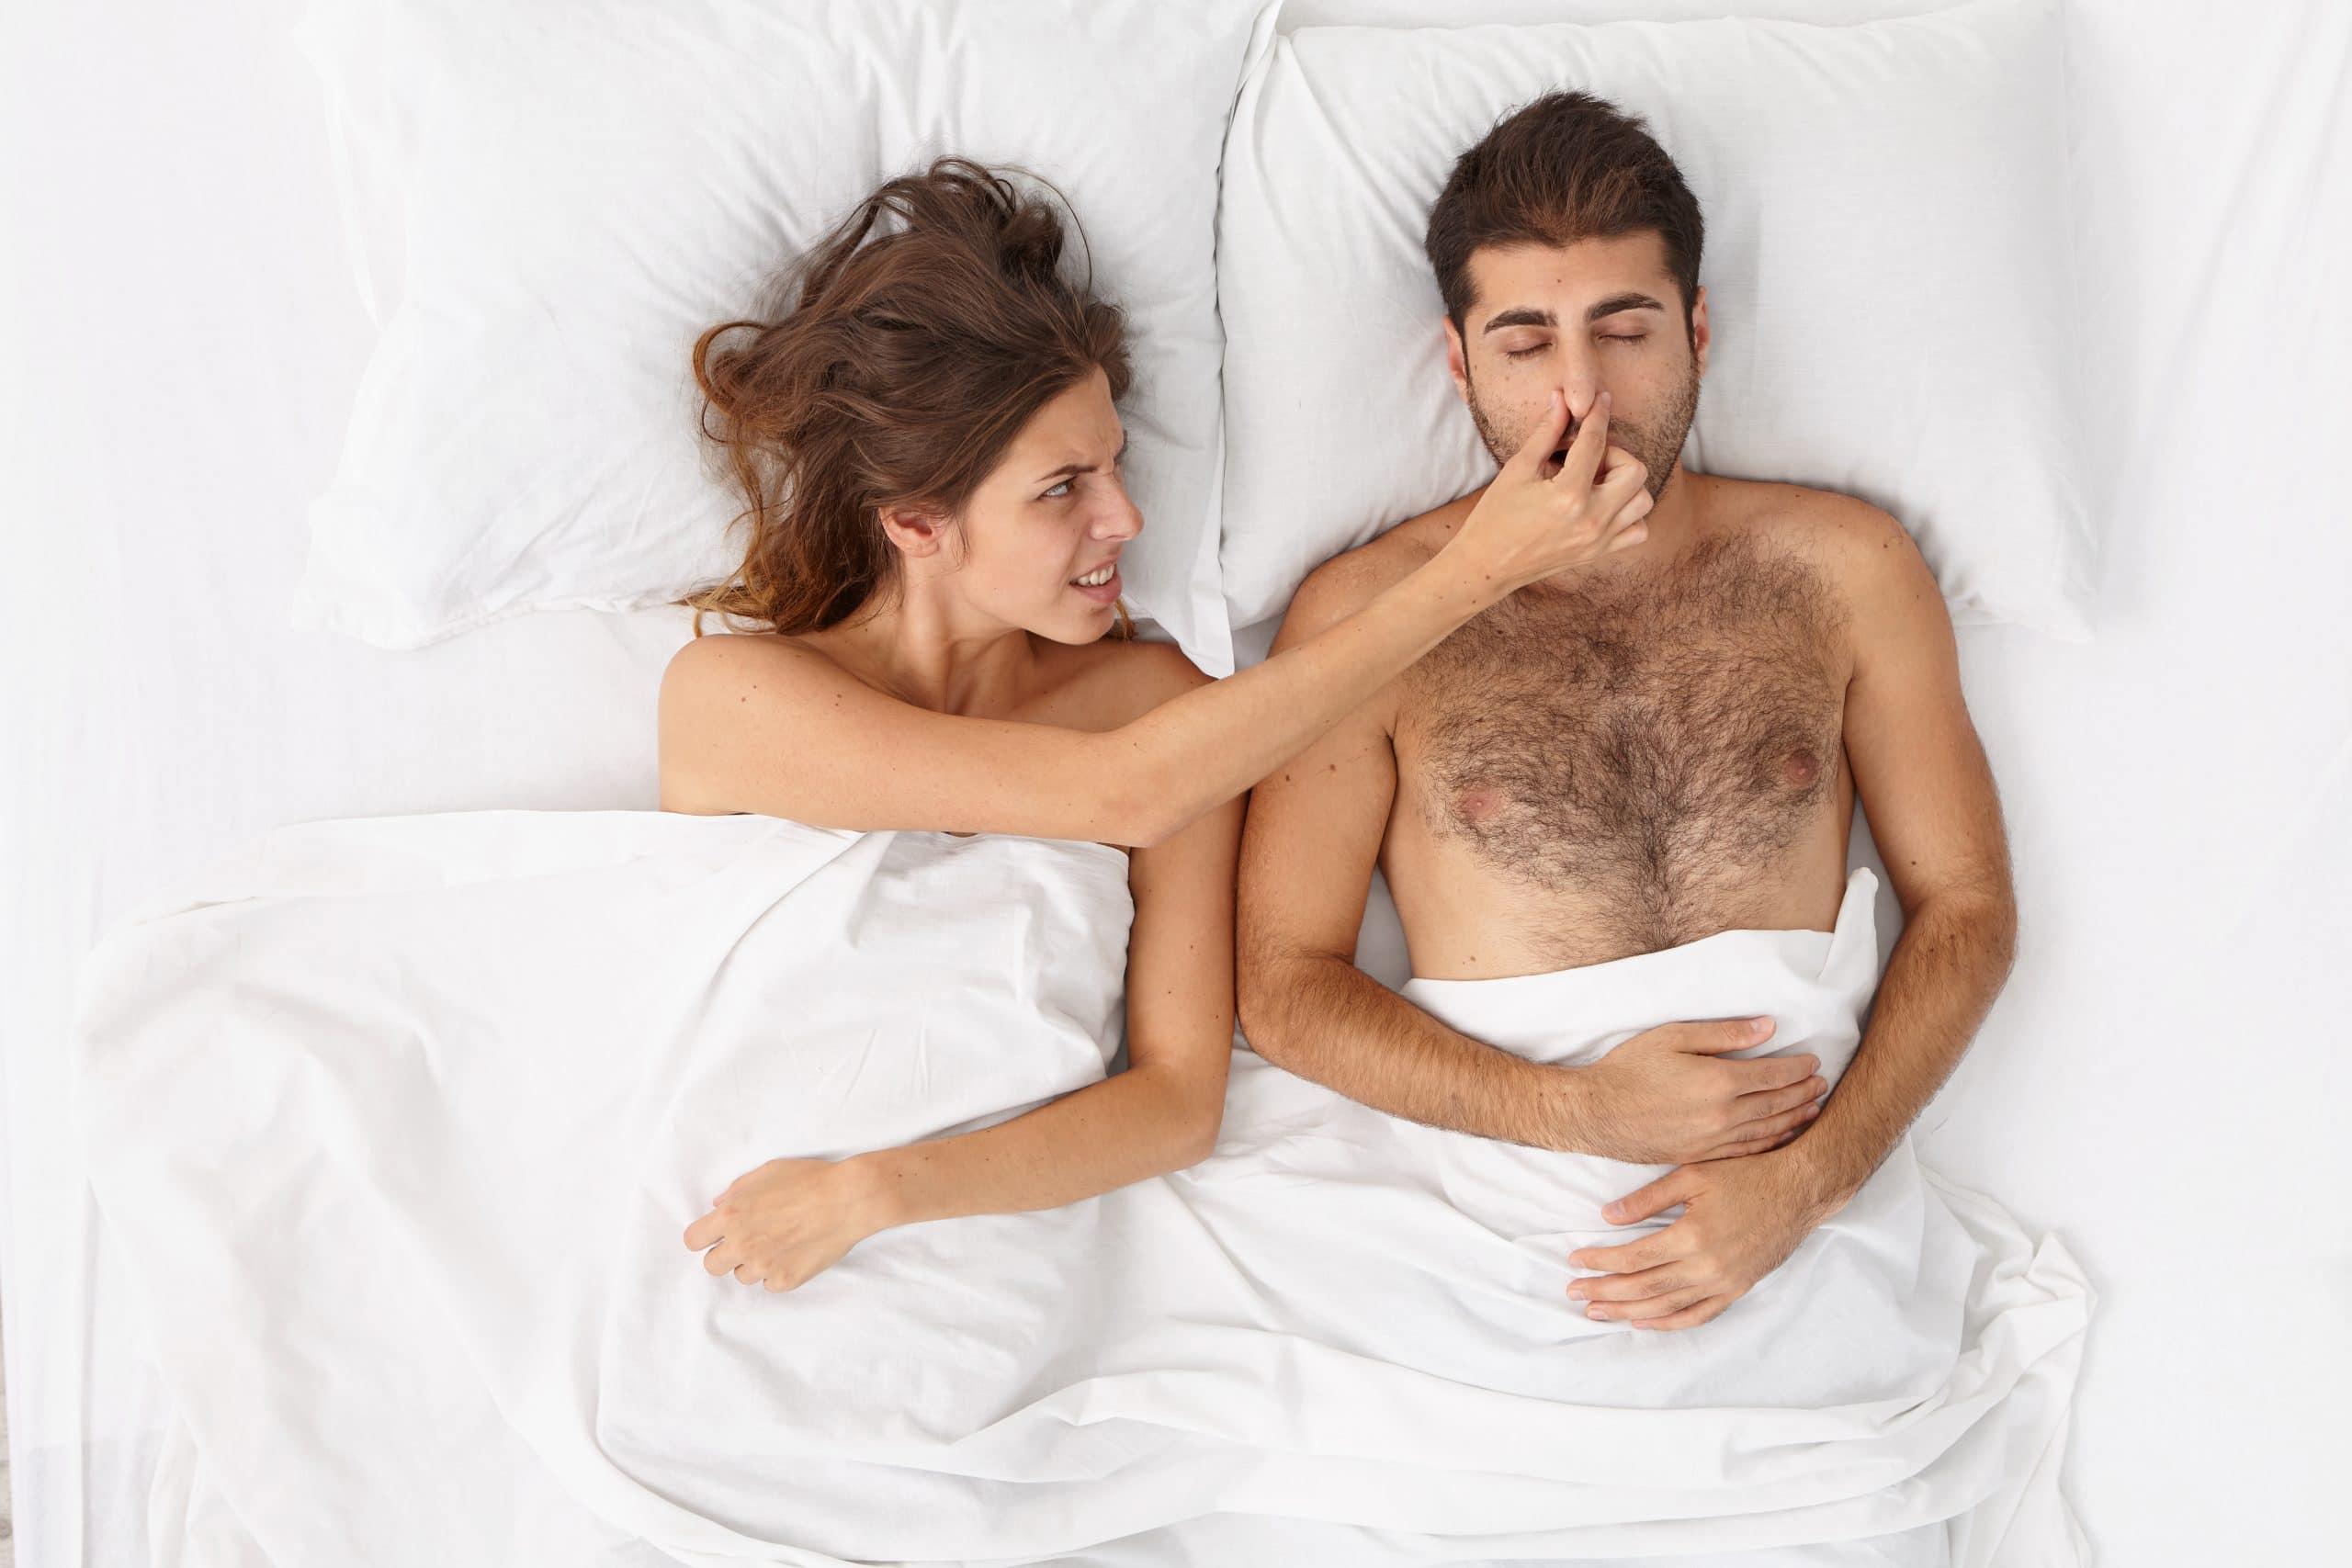 L'apnea notturna fa male al cuore: ecco perché